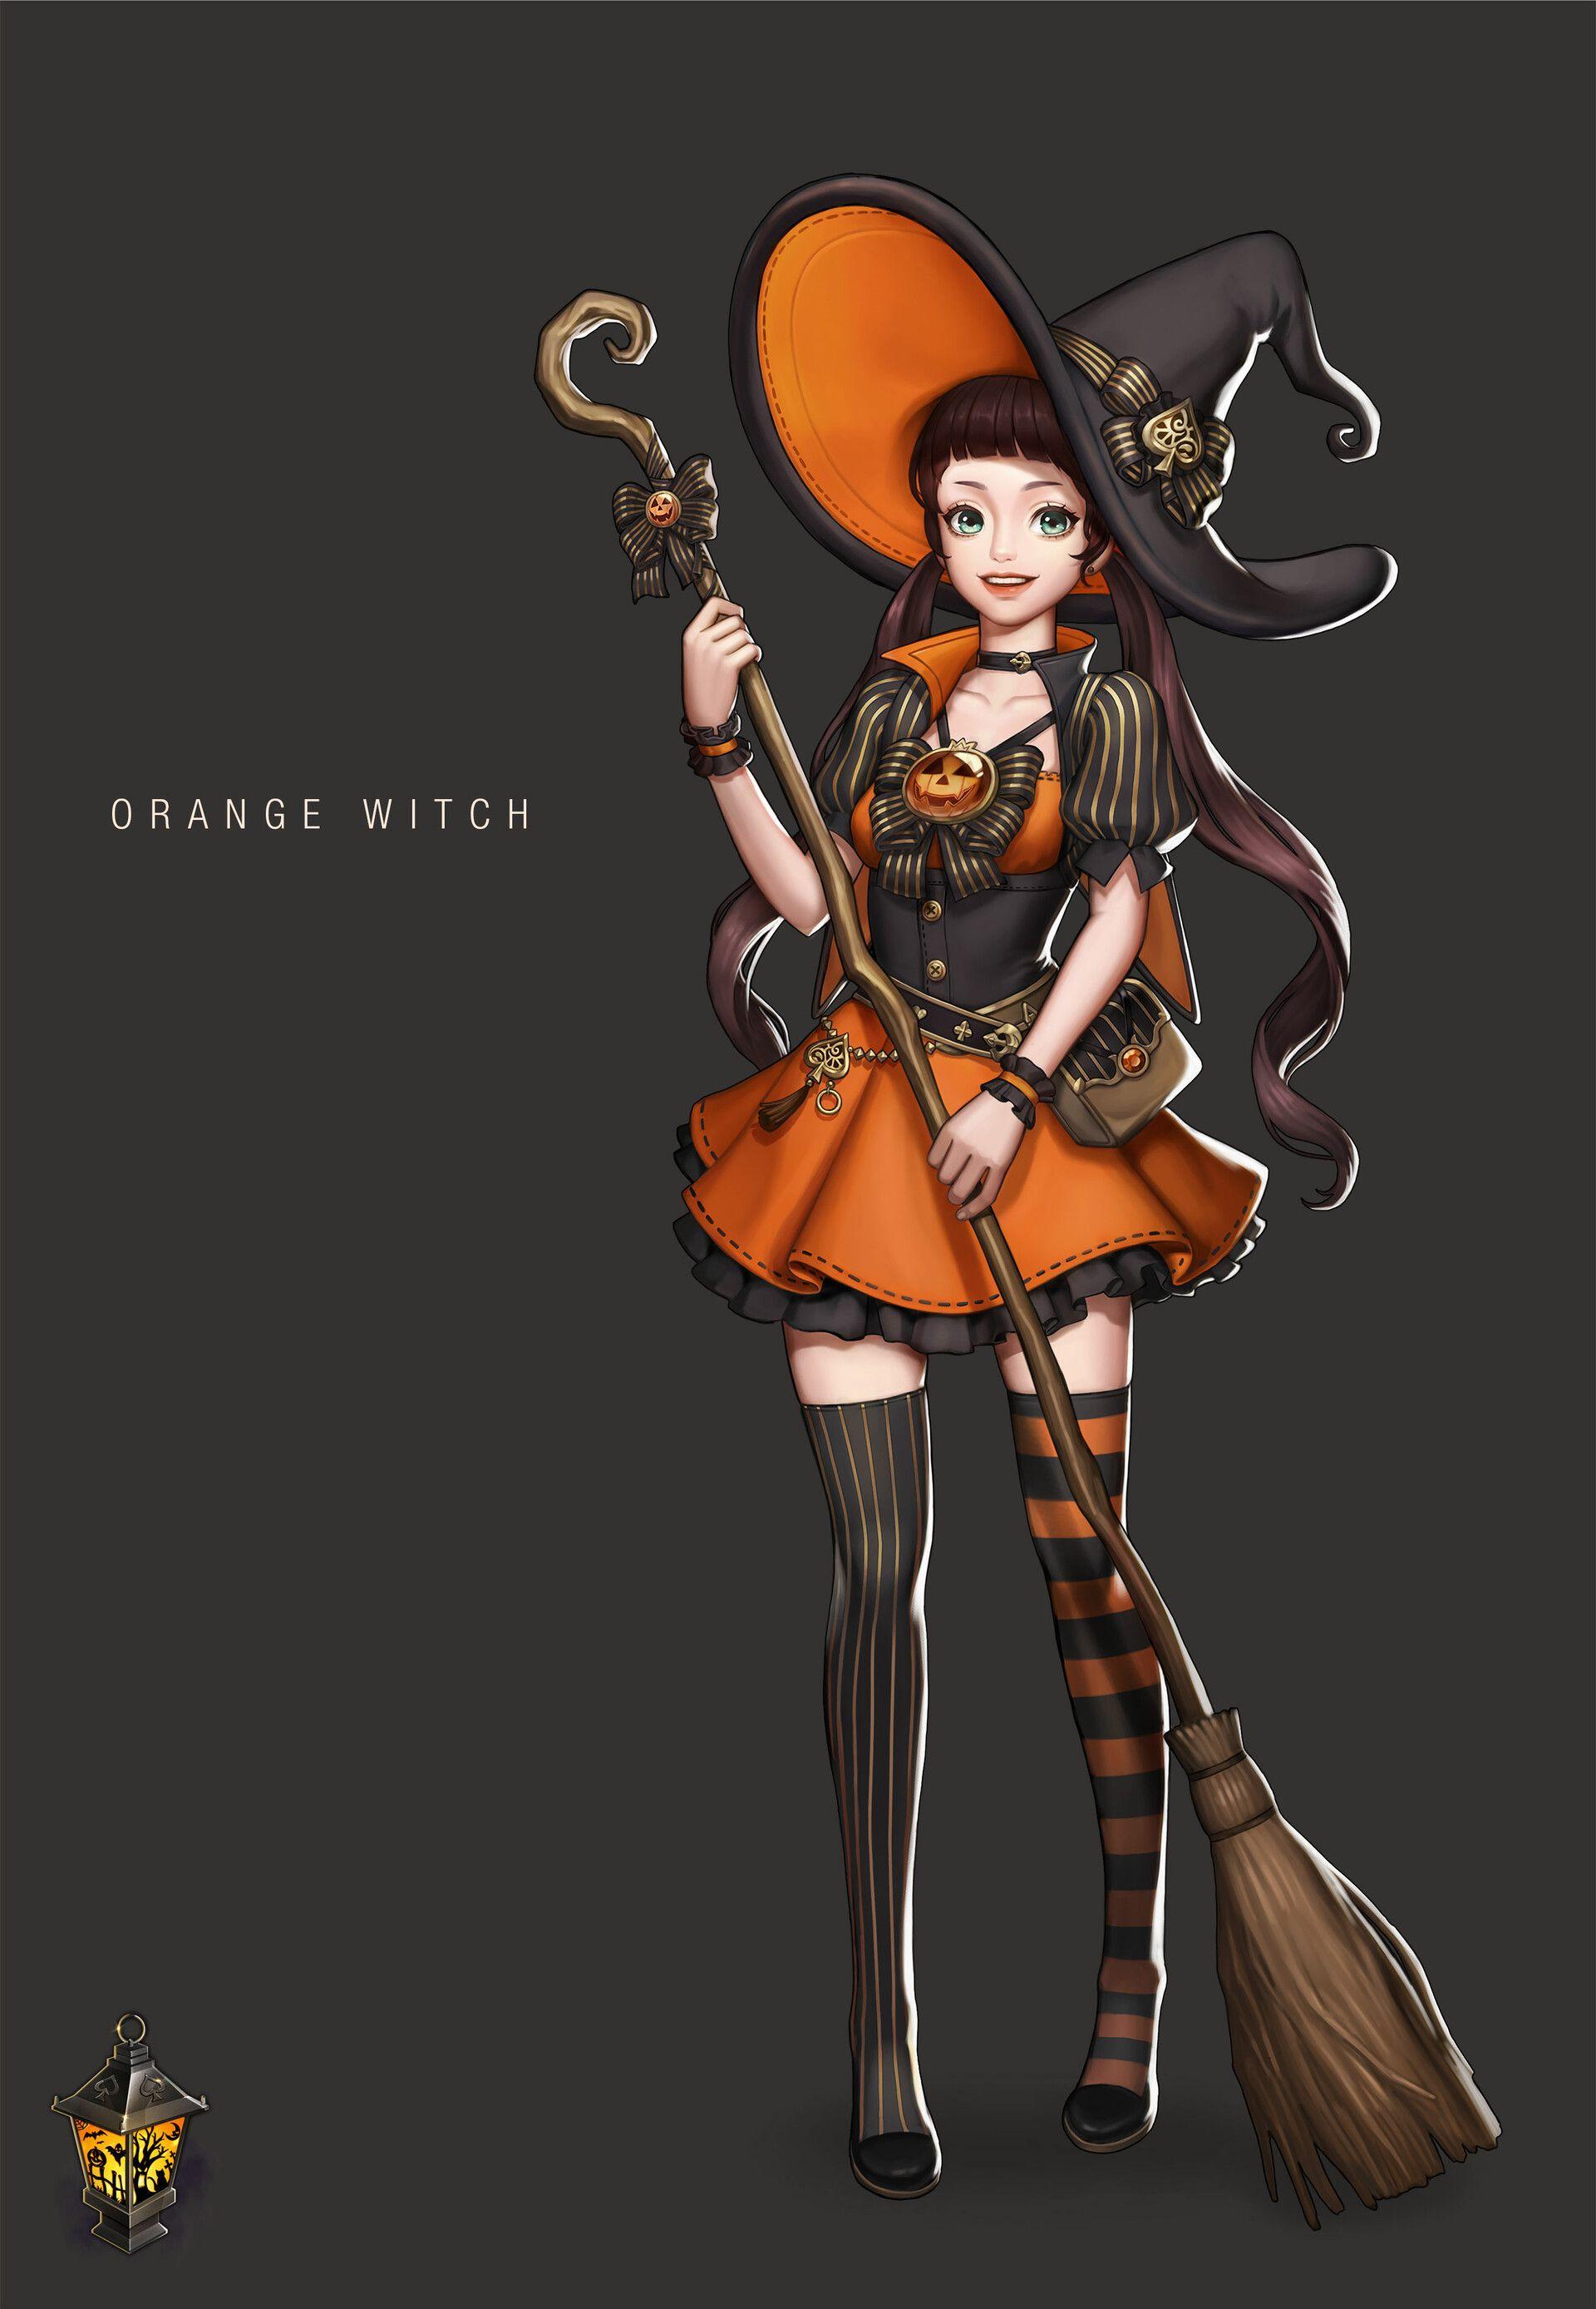 Artstation orange witch yoonart witch aesthetic